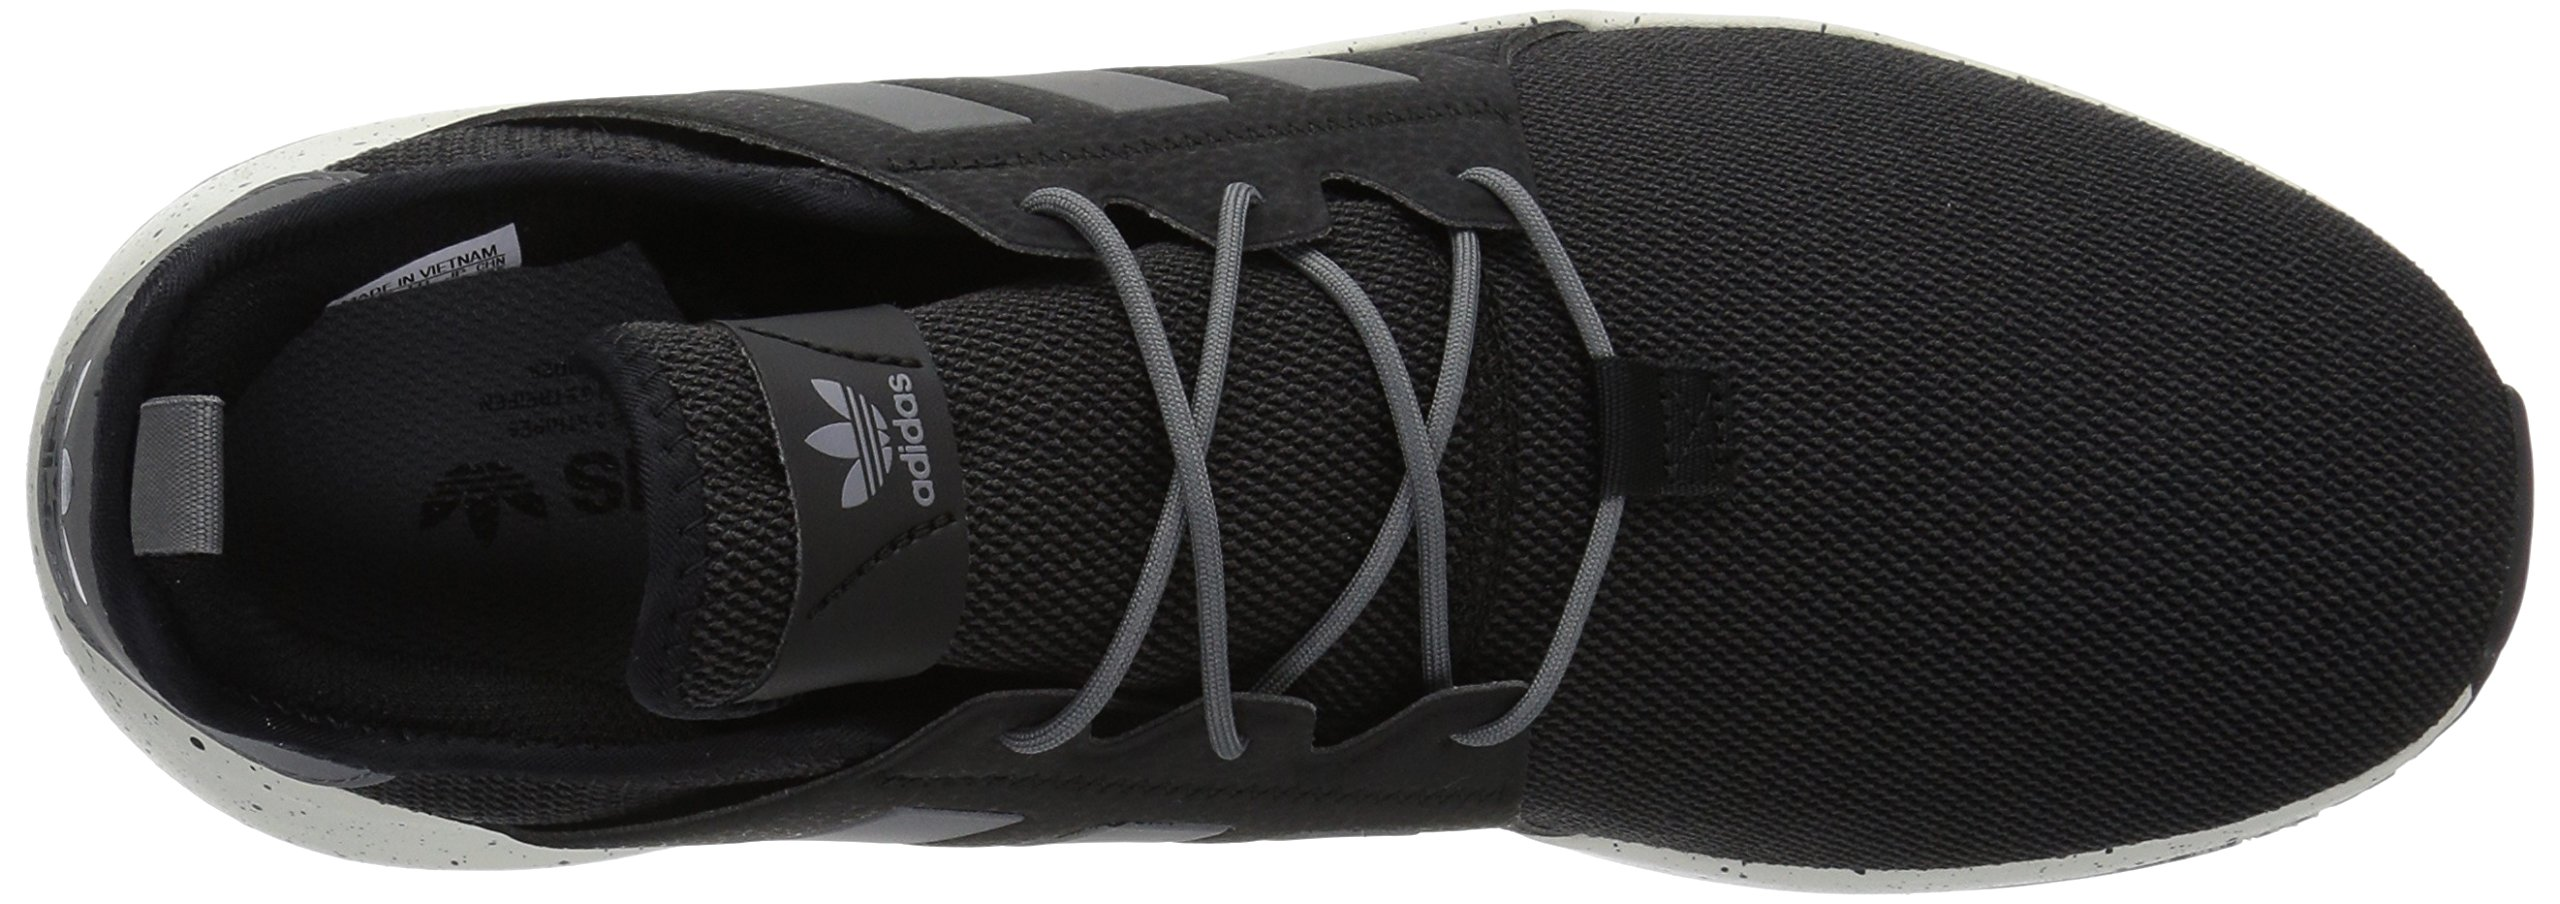 adidas Originals Mens X_PLR Running Shoe Sneaker Grey/Black, 4.5 M US by adidas Originals (Image #8)